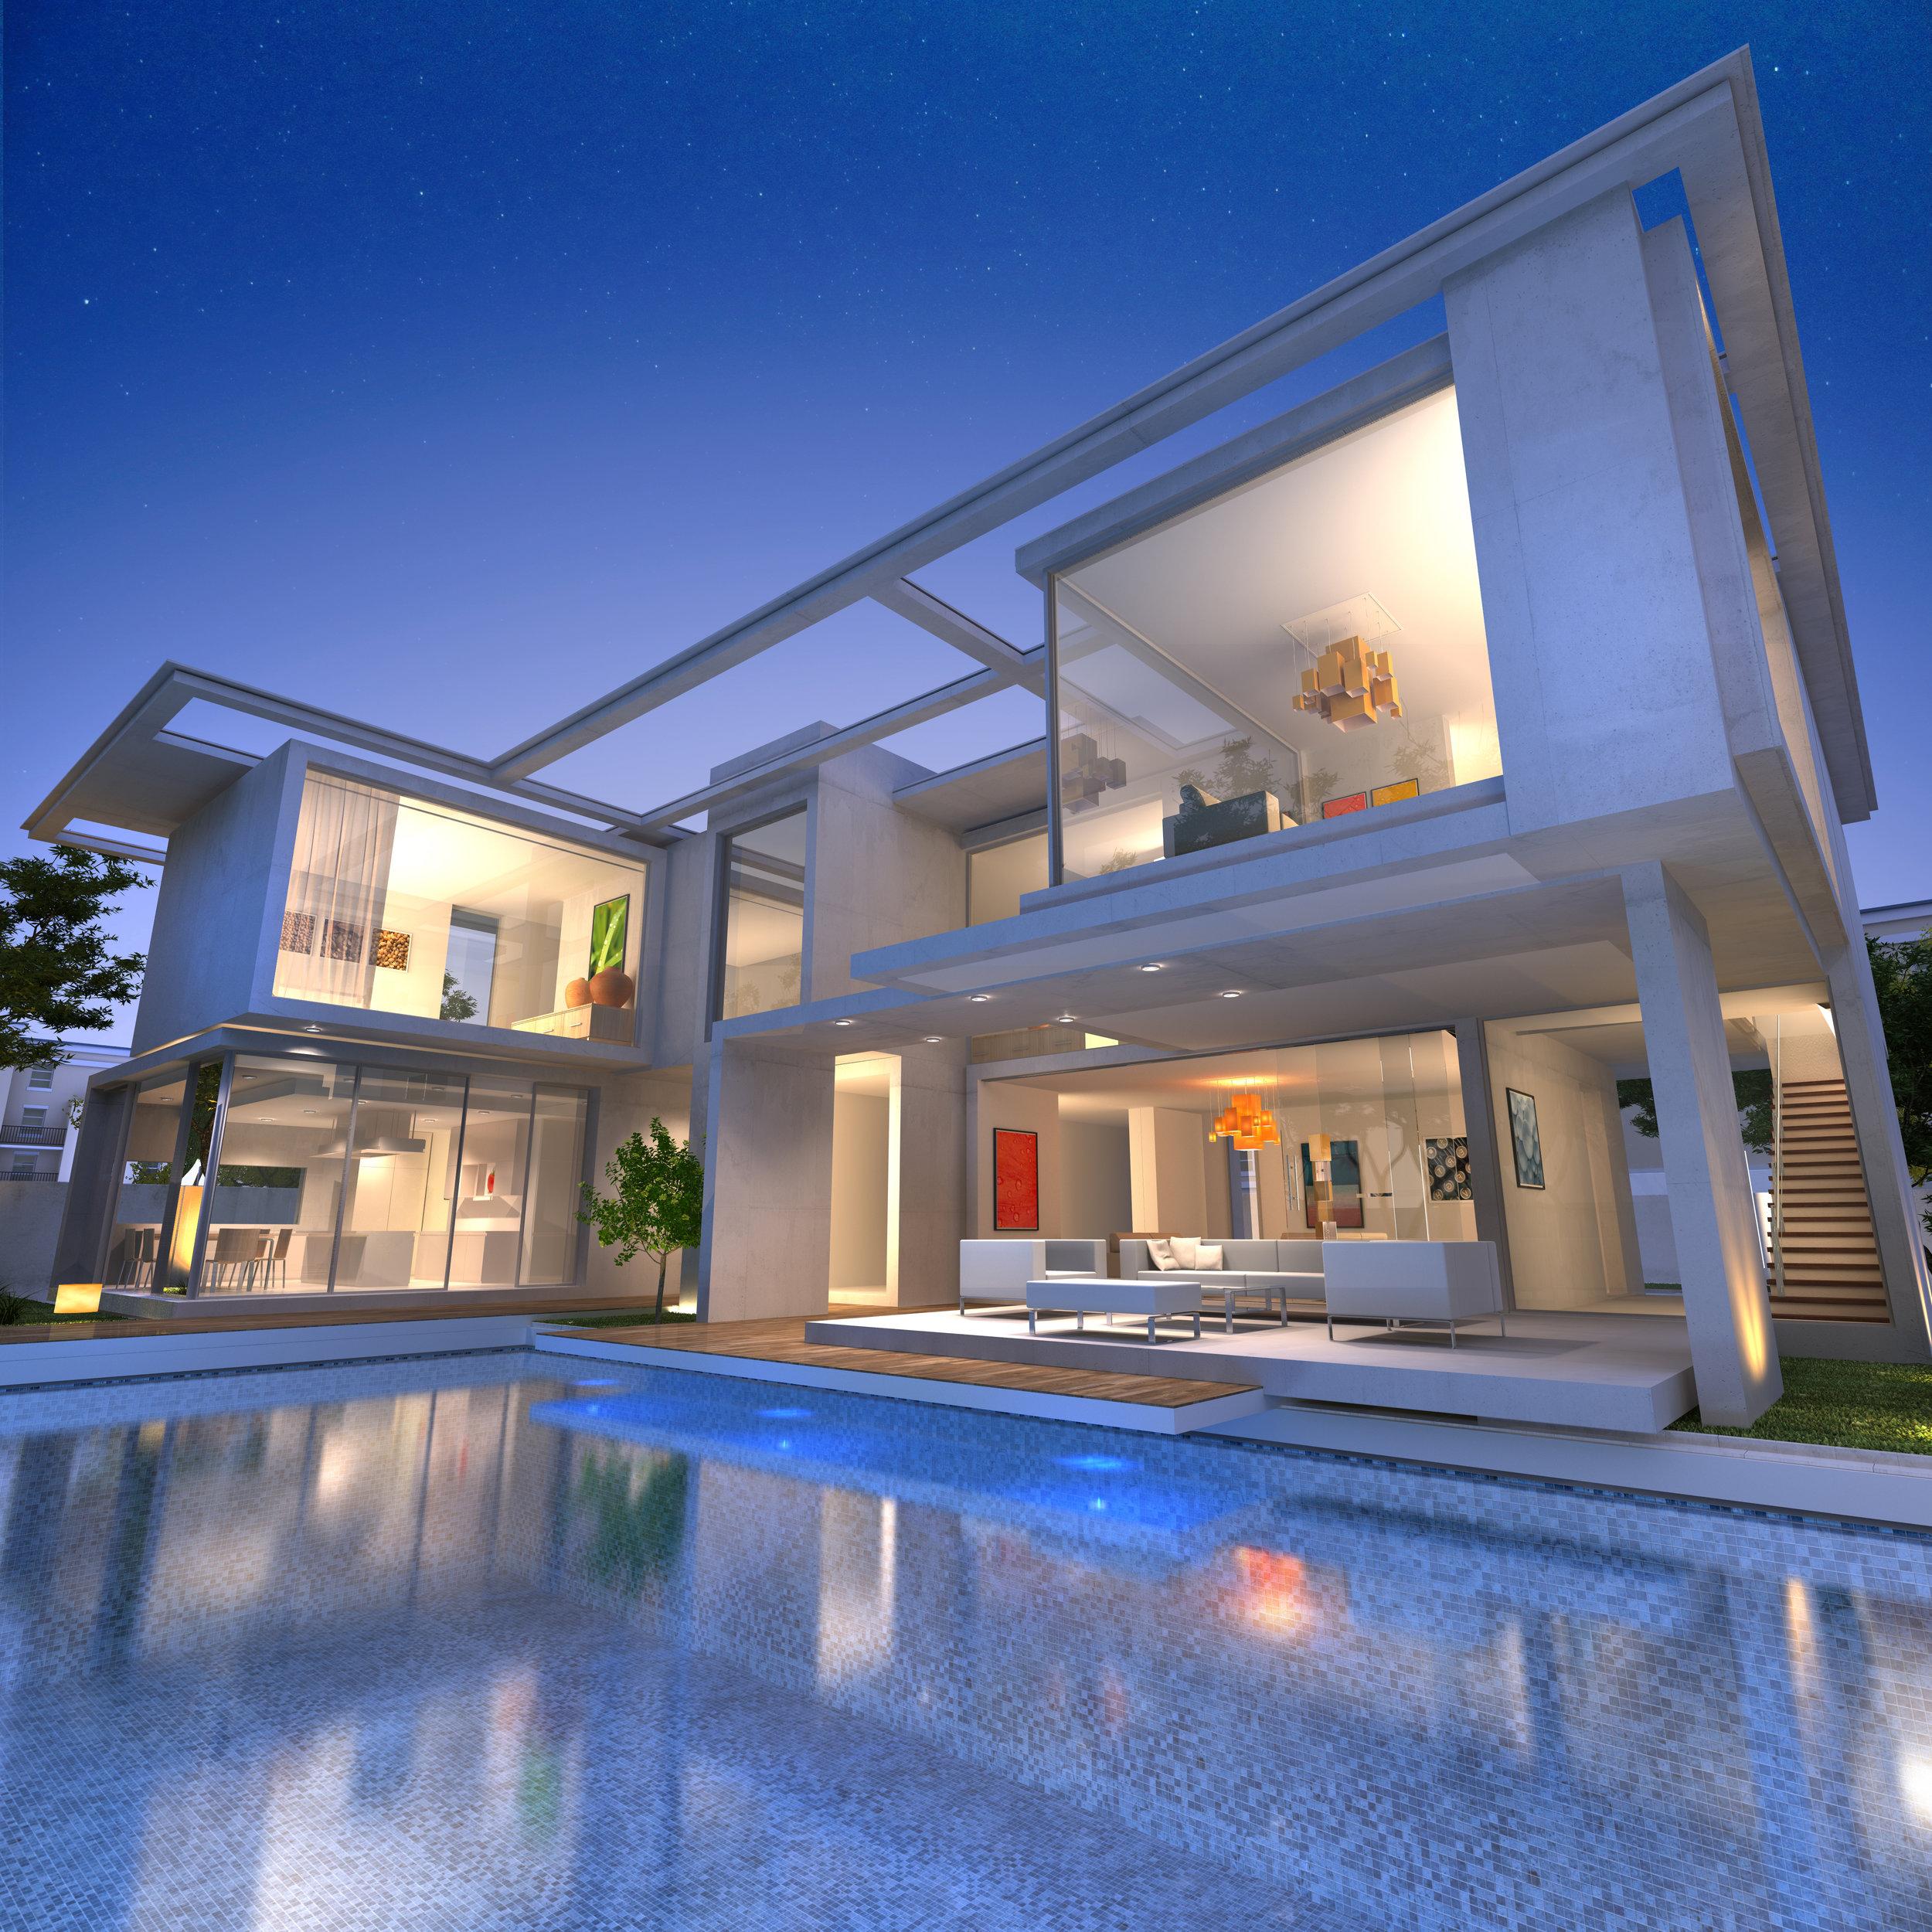 Real Estate Listing Marketing Image 1